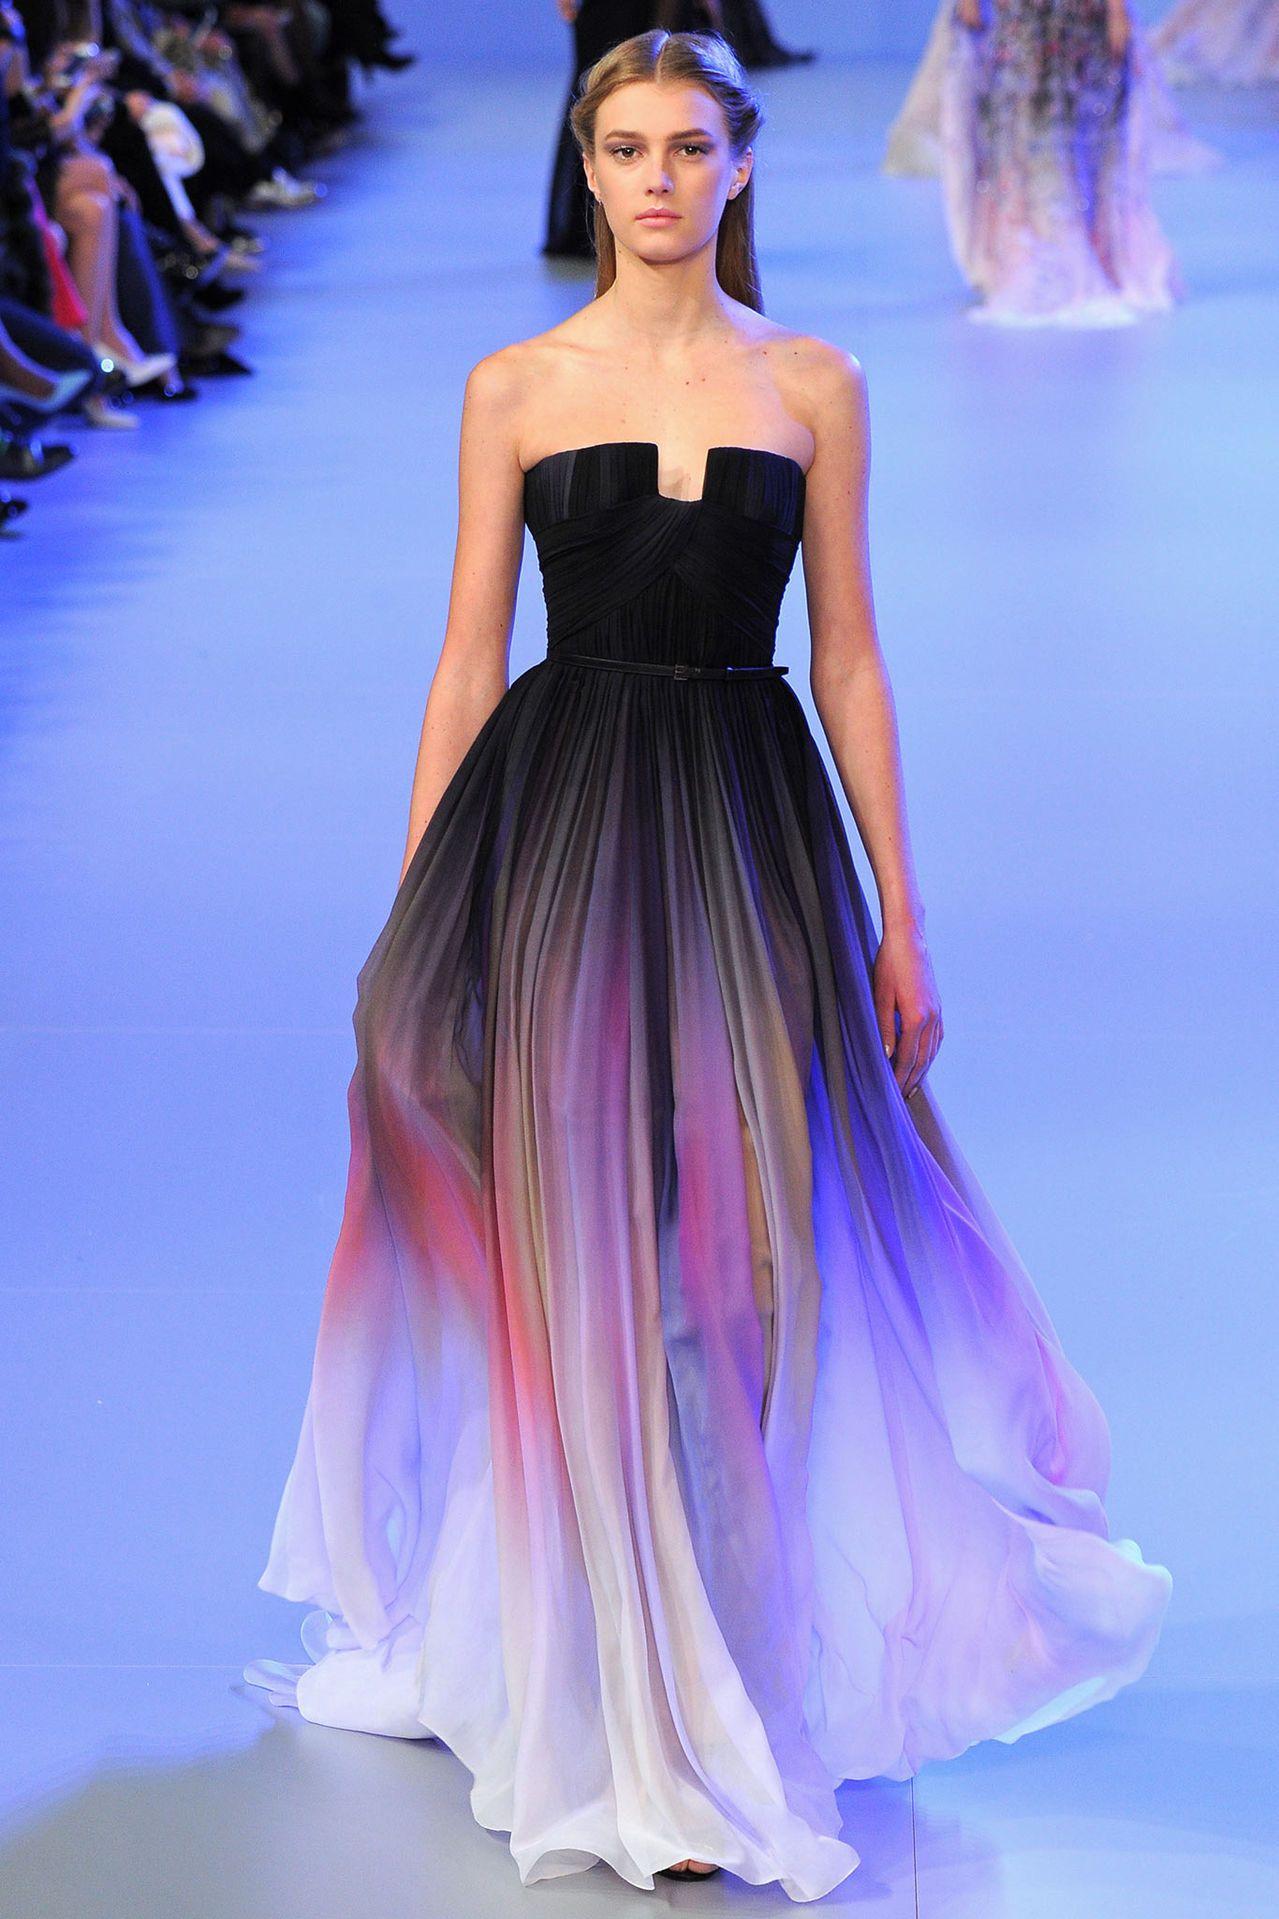 dreamer weaver | Clothes | Pinterest | Vestiditos